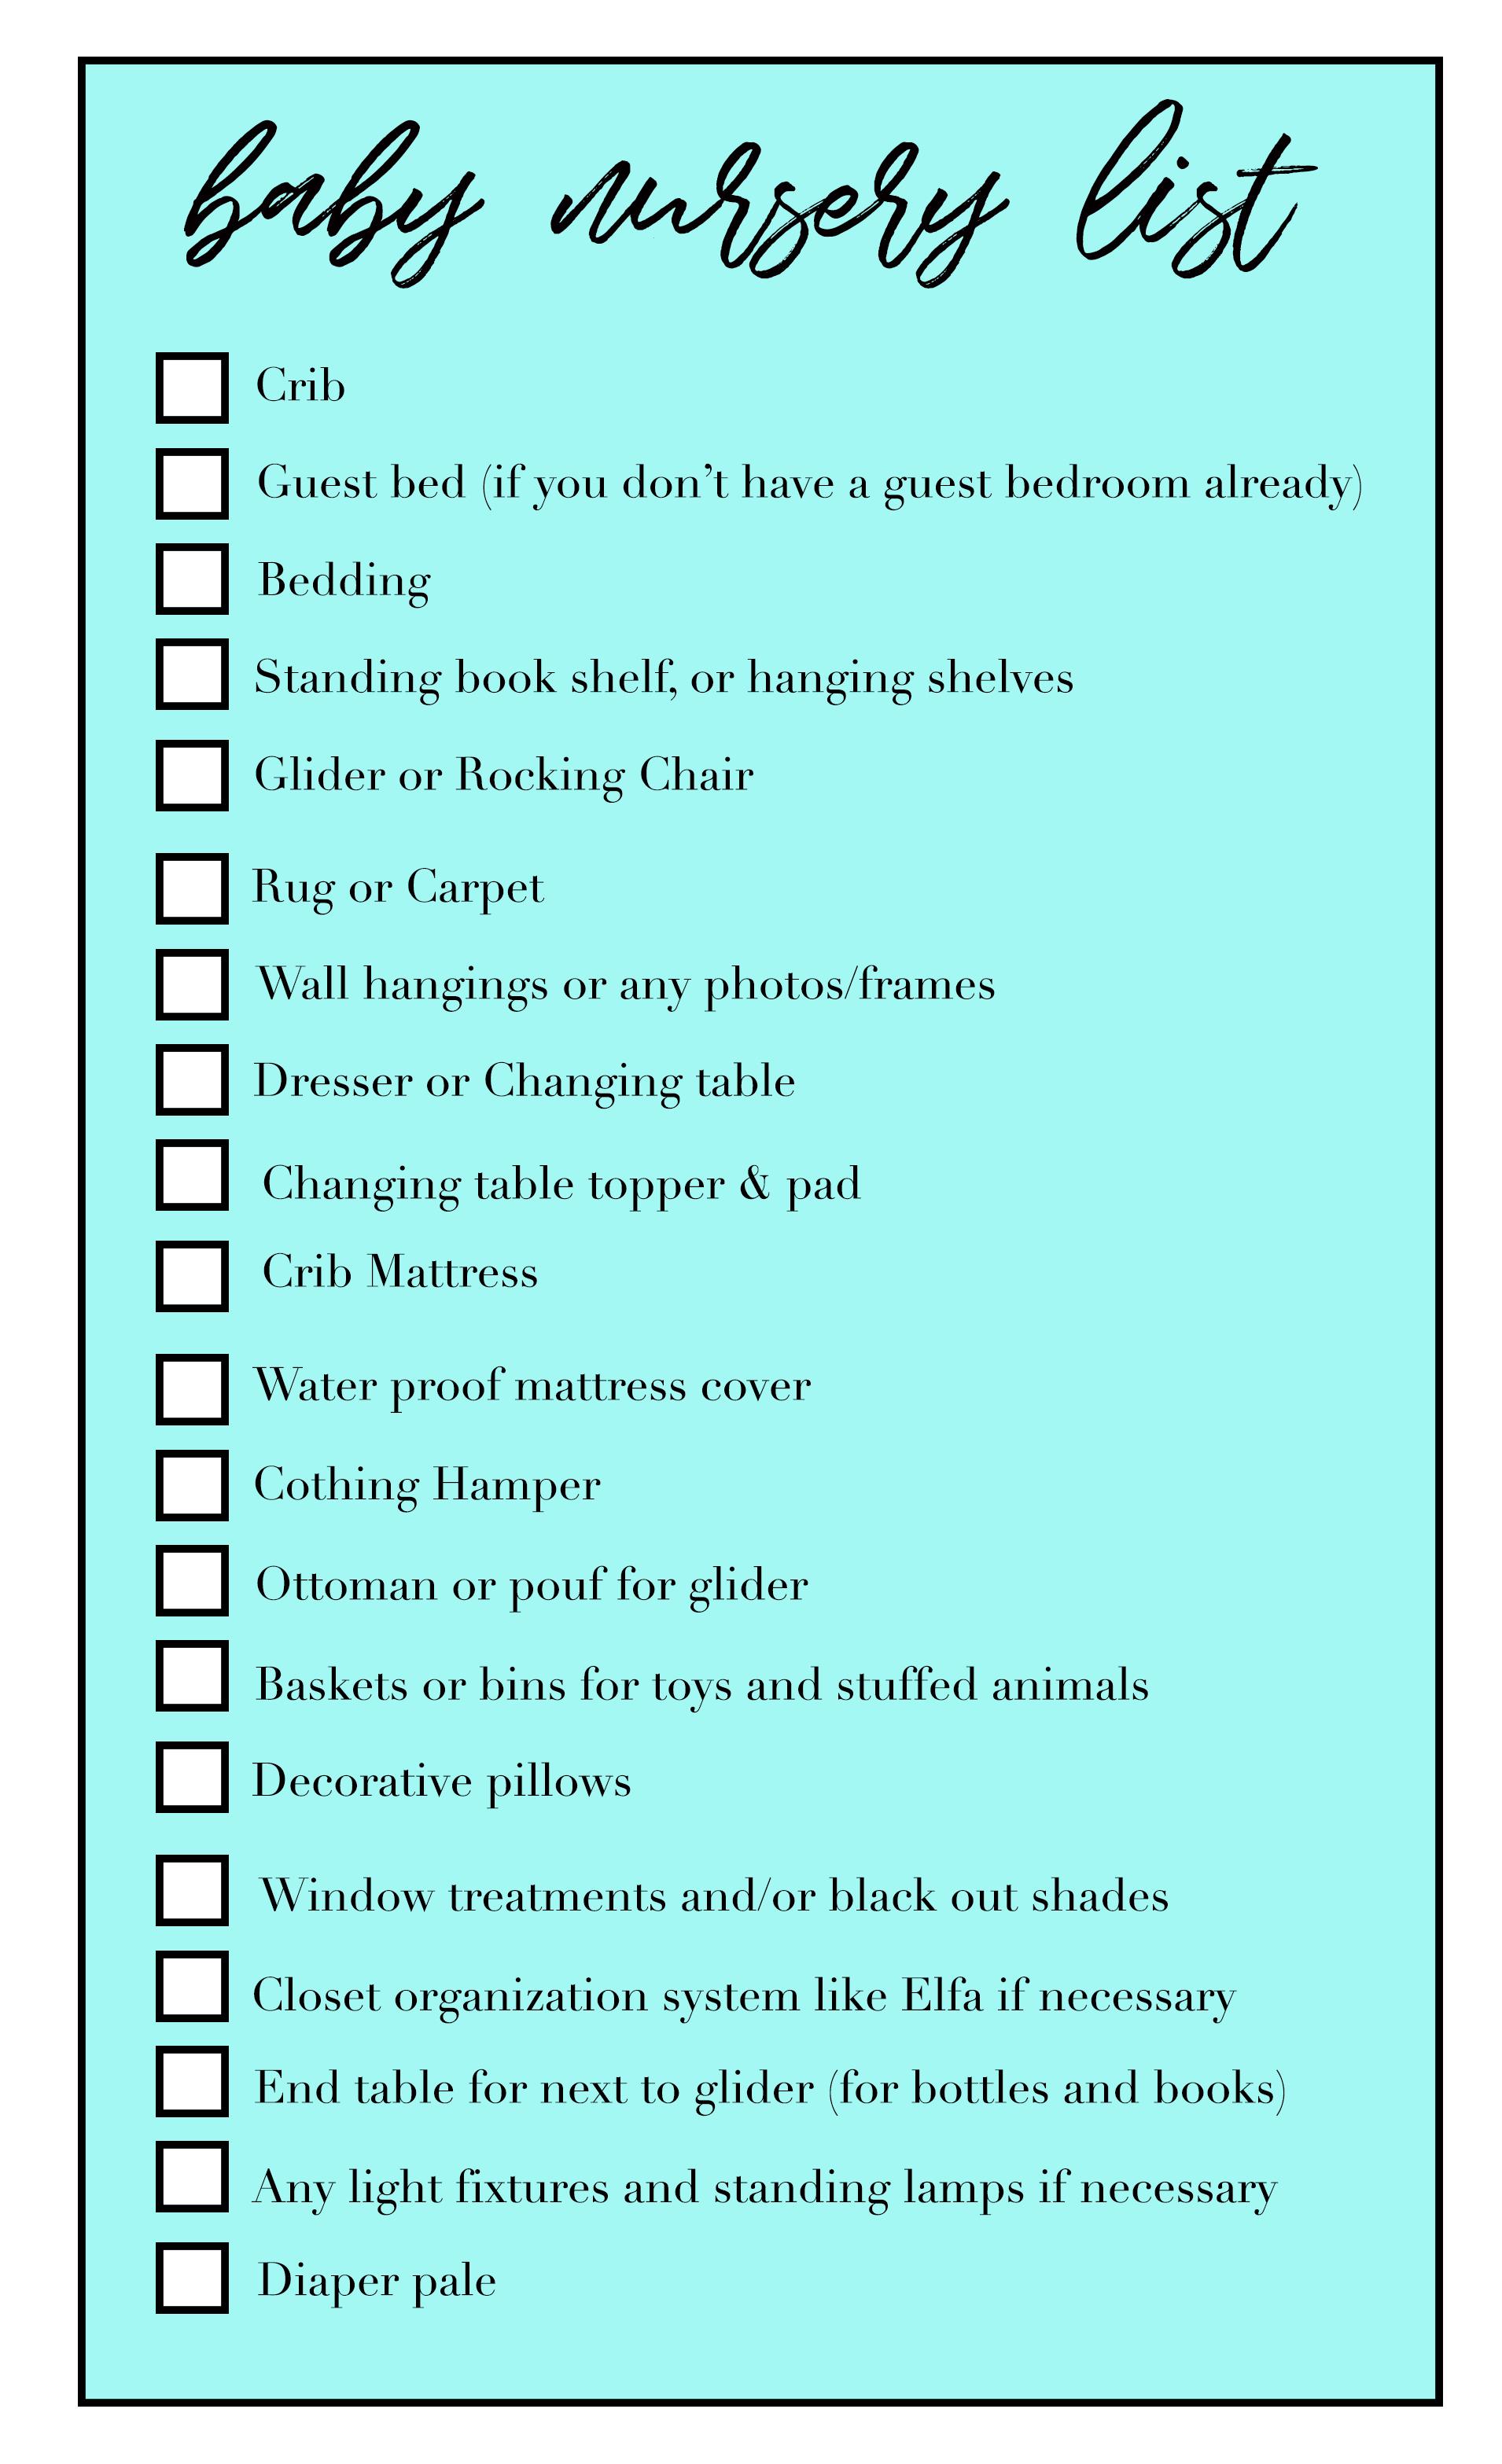 Nursery Checklist.jpg